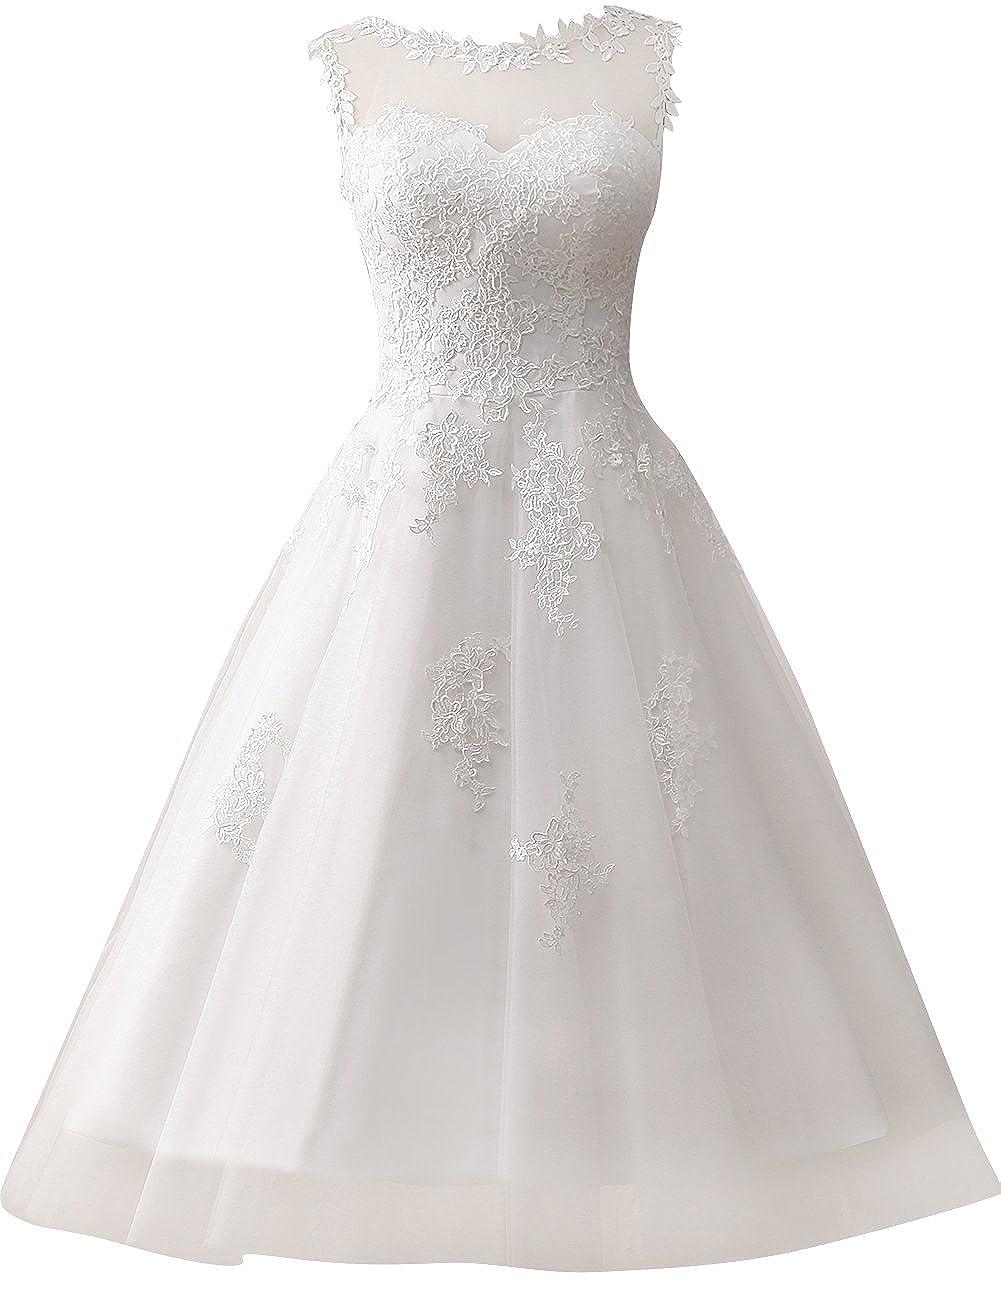 Jaeden Appliques Lace Short Wedding Dresses Tulle Bridal Gown For